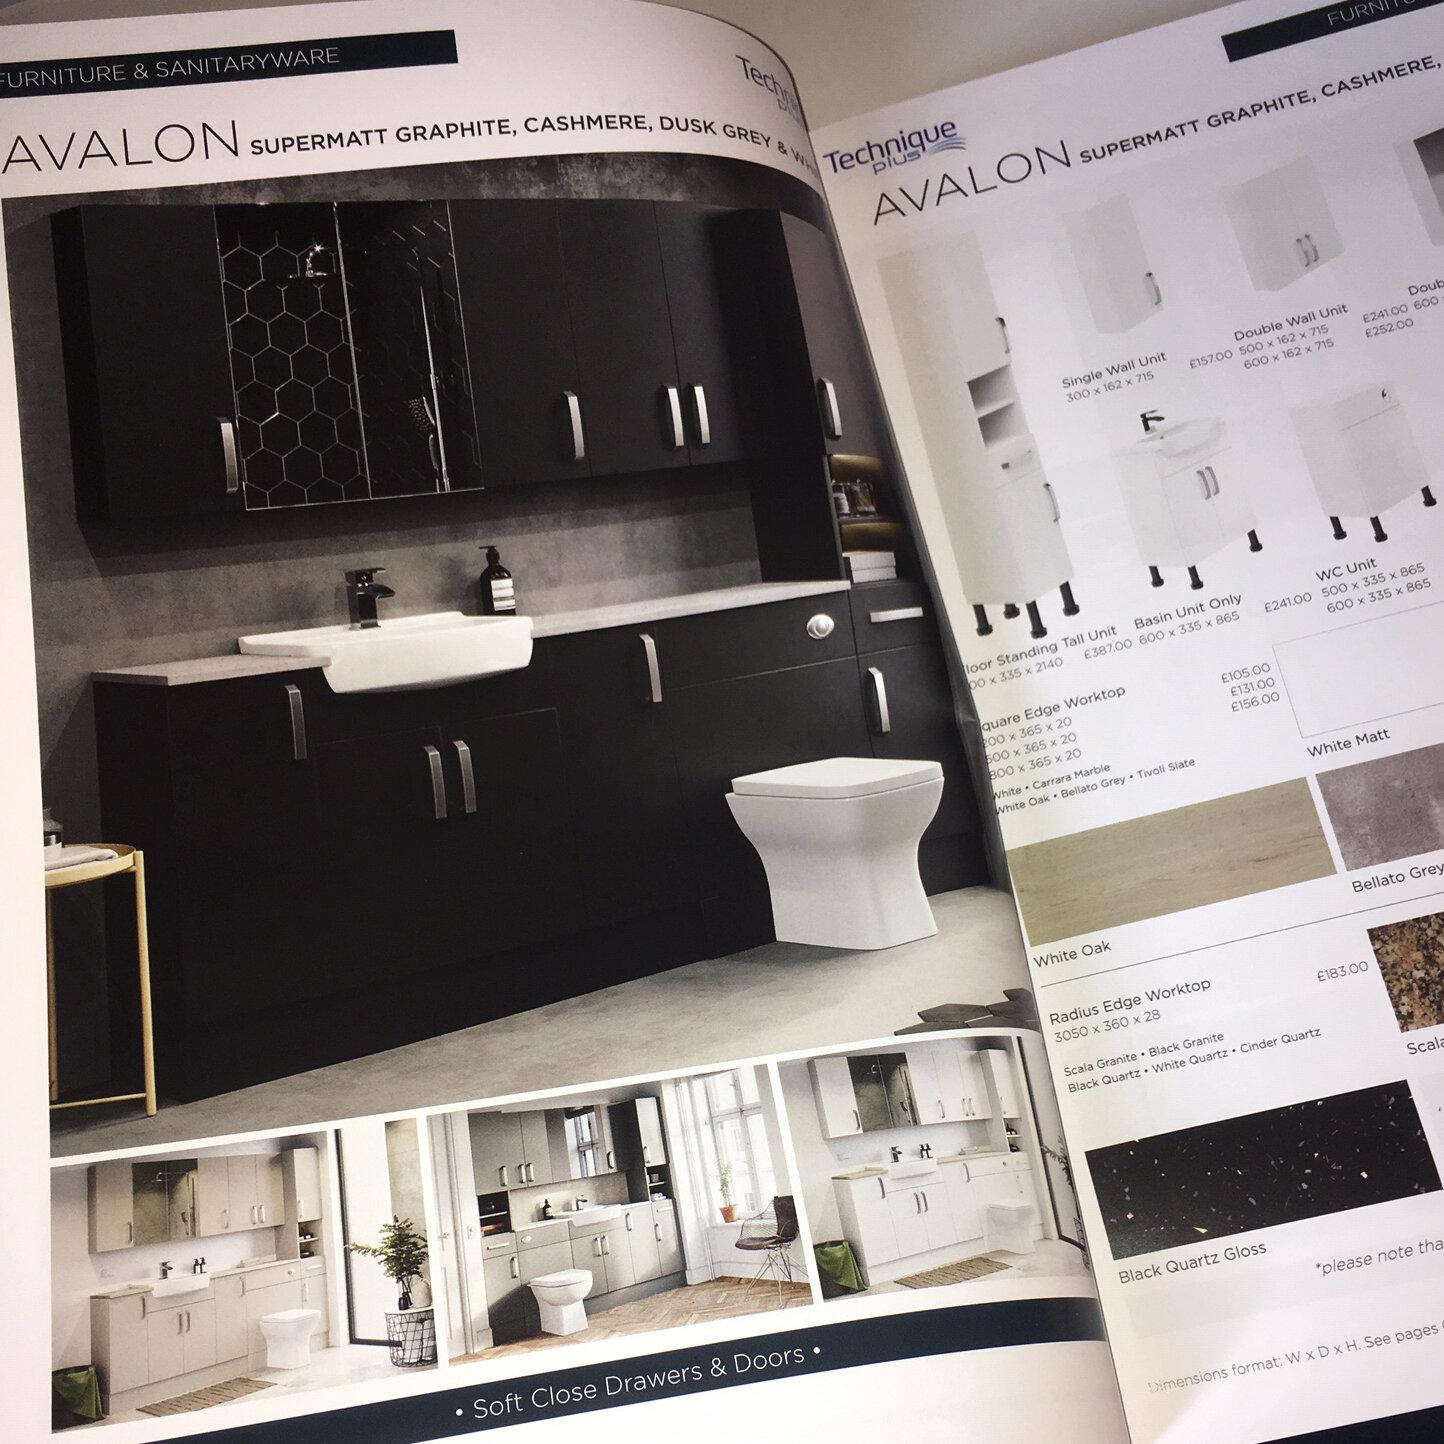 Bathrooms in Liverpool